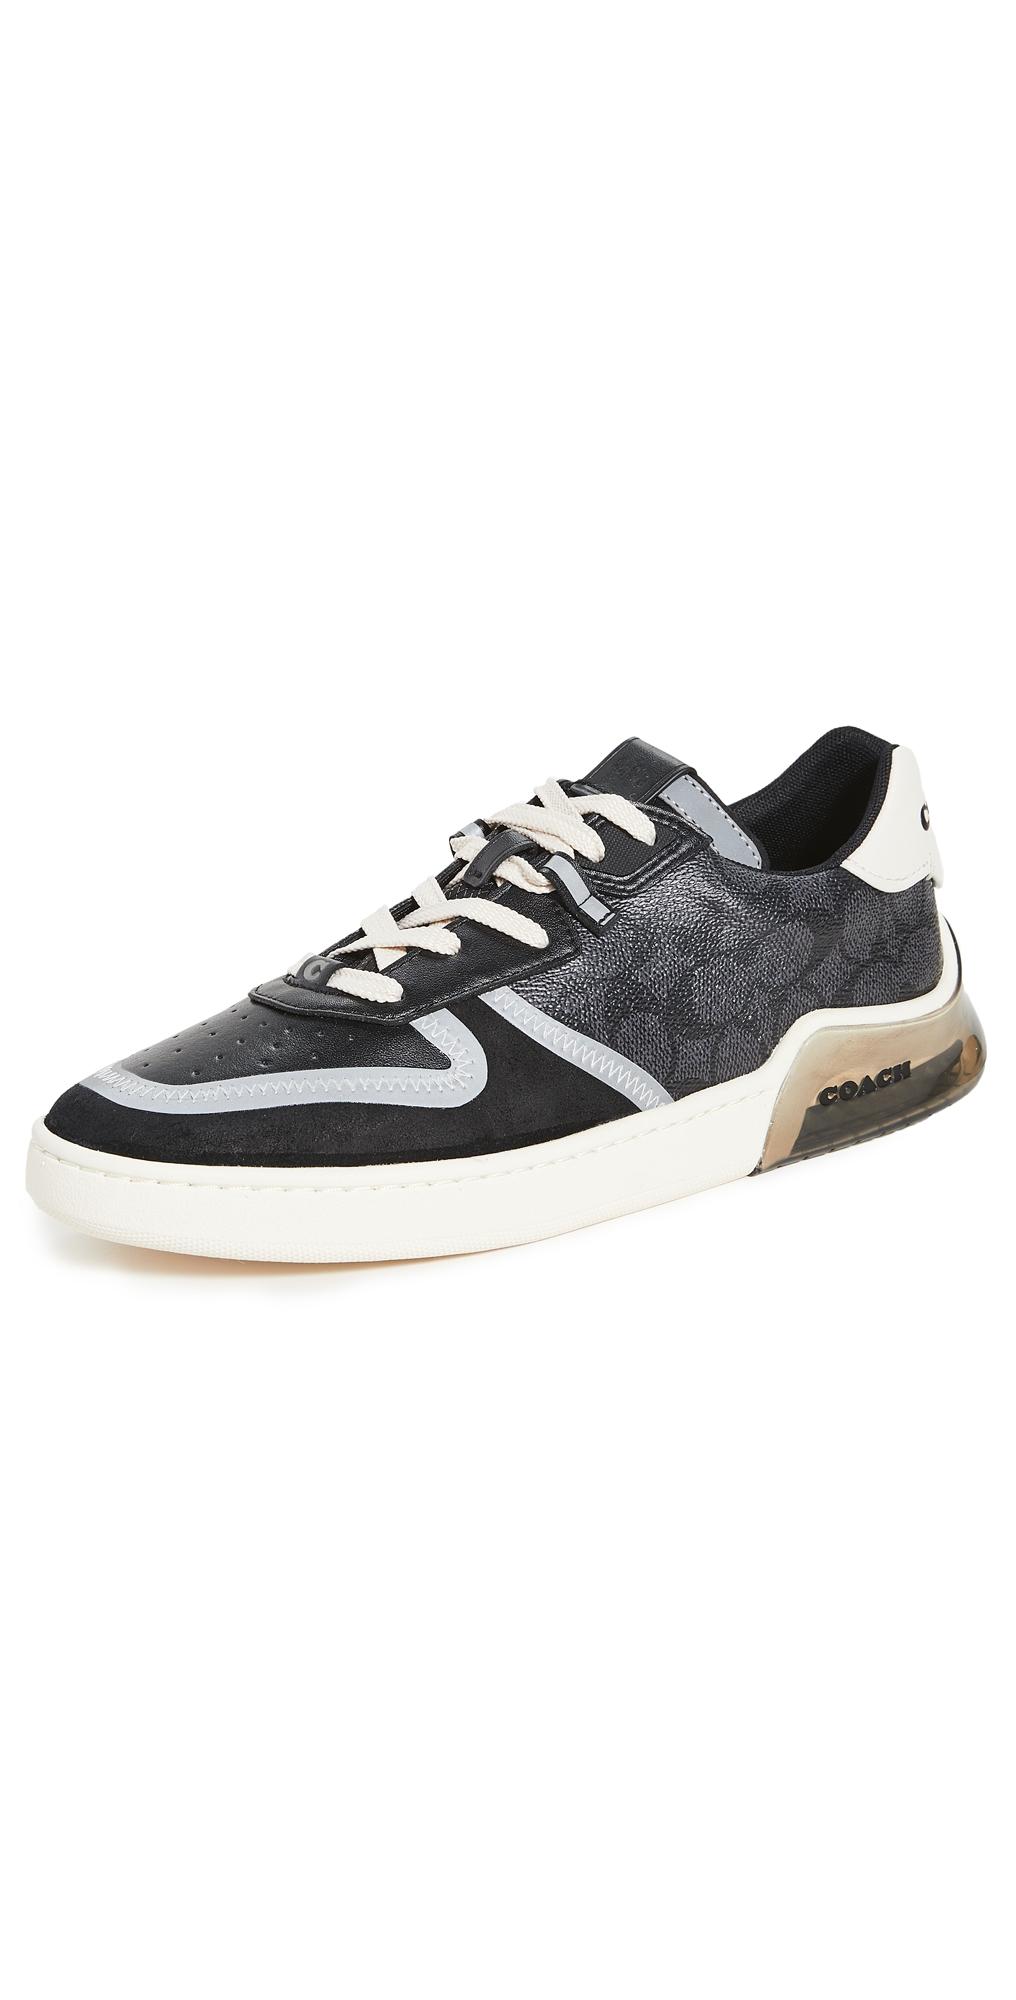 CitySole Signature Tech Court Sneakers